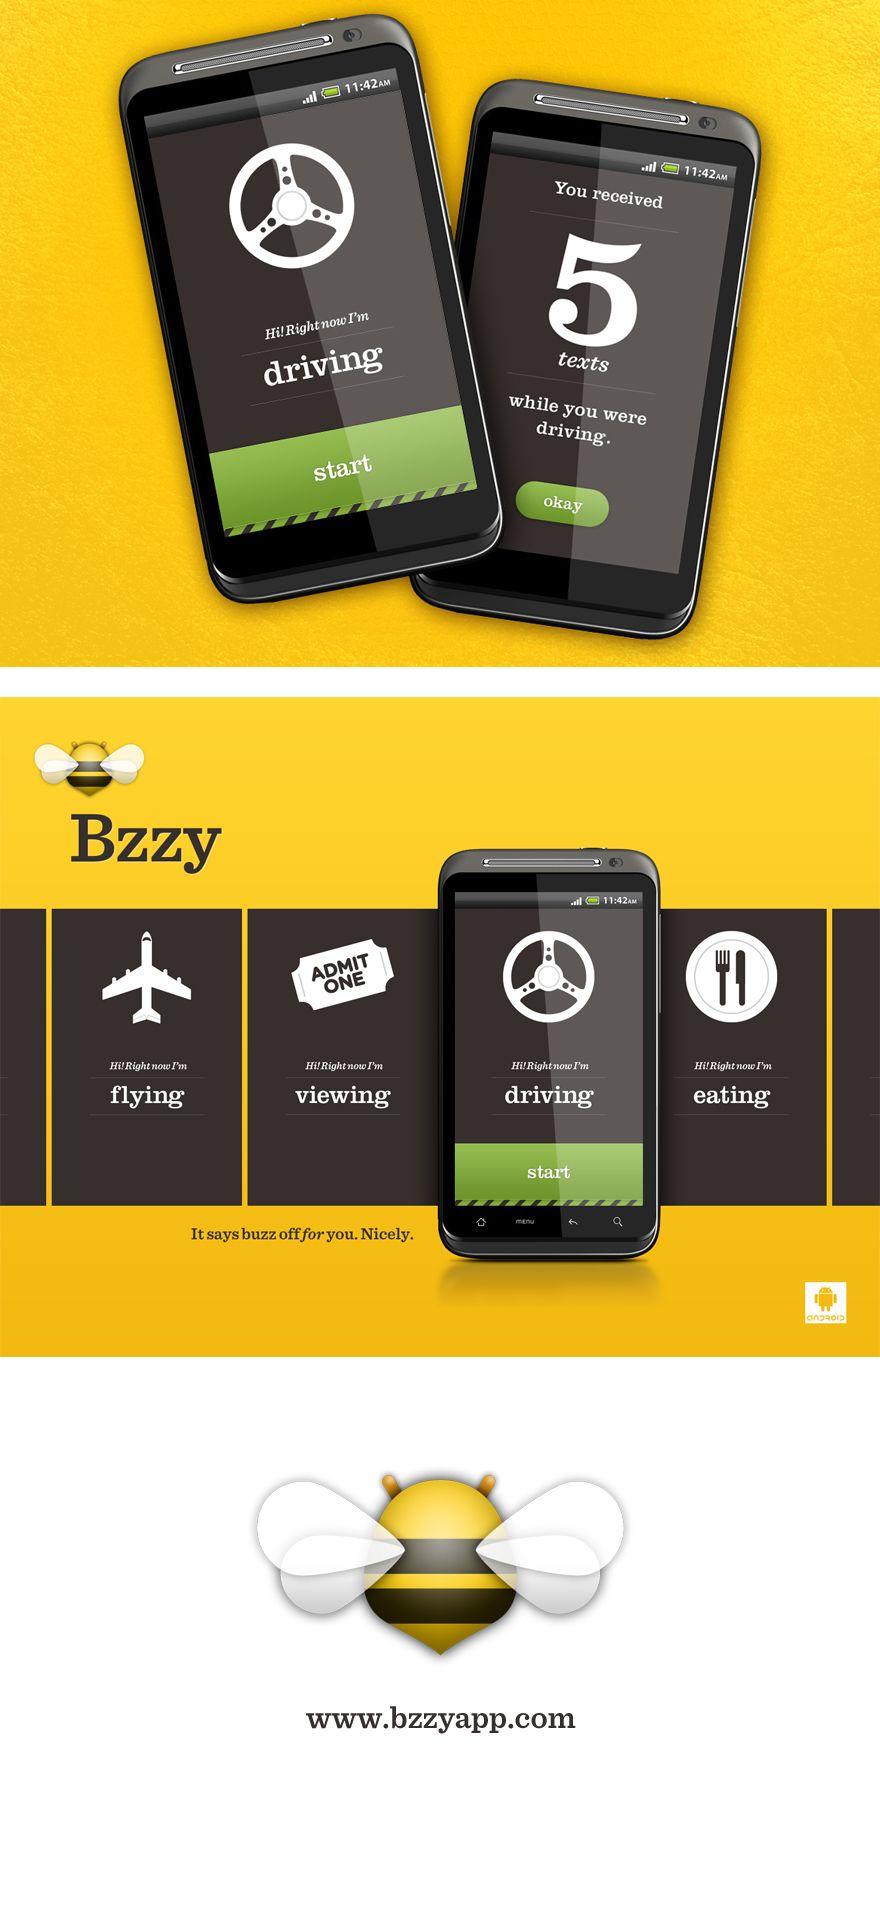 football app App interface design, Android app design